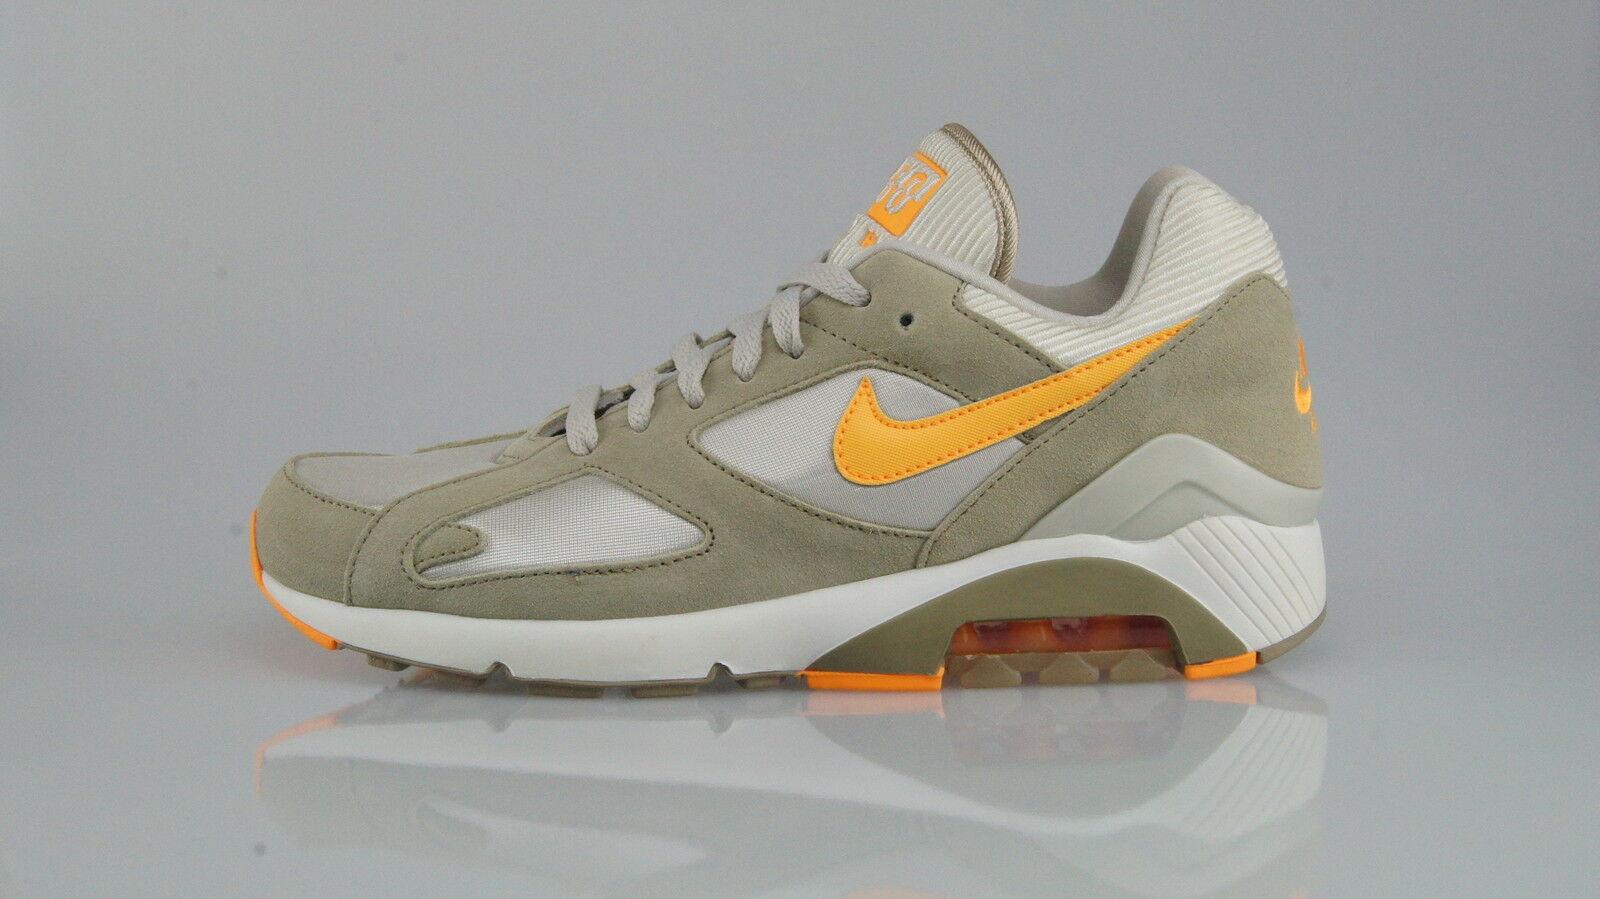 Nike air max 180 misura 42 (8,5us)